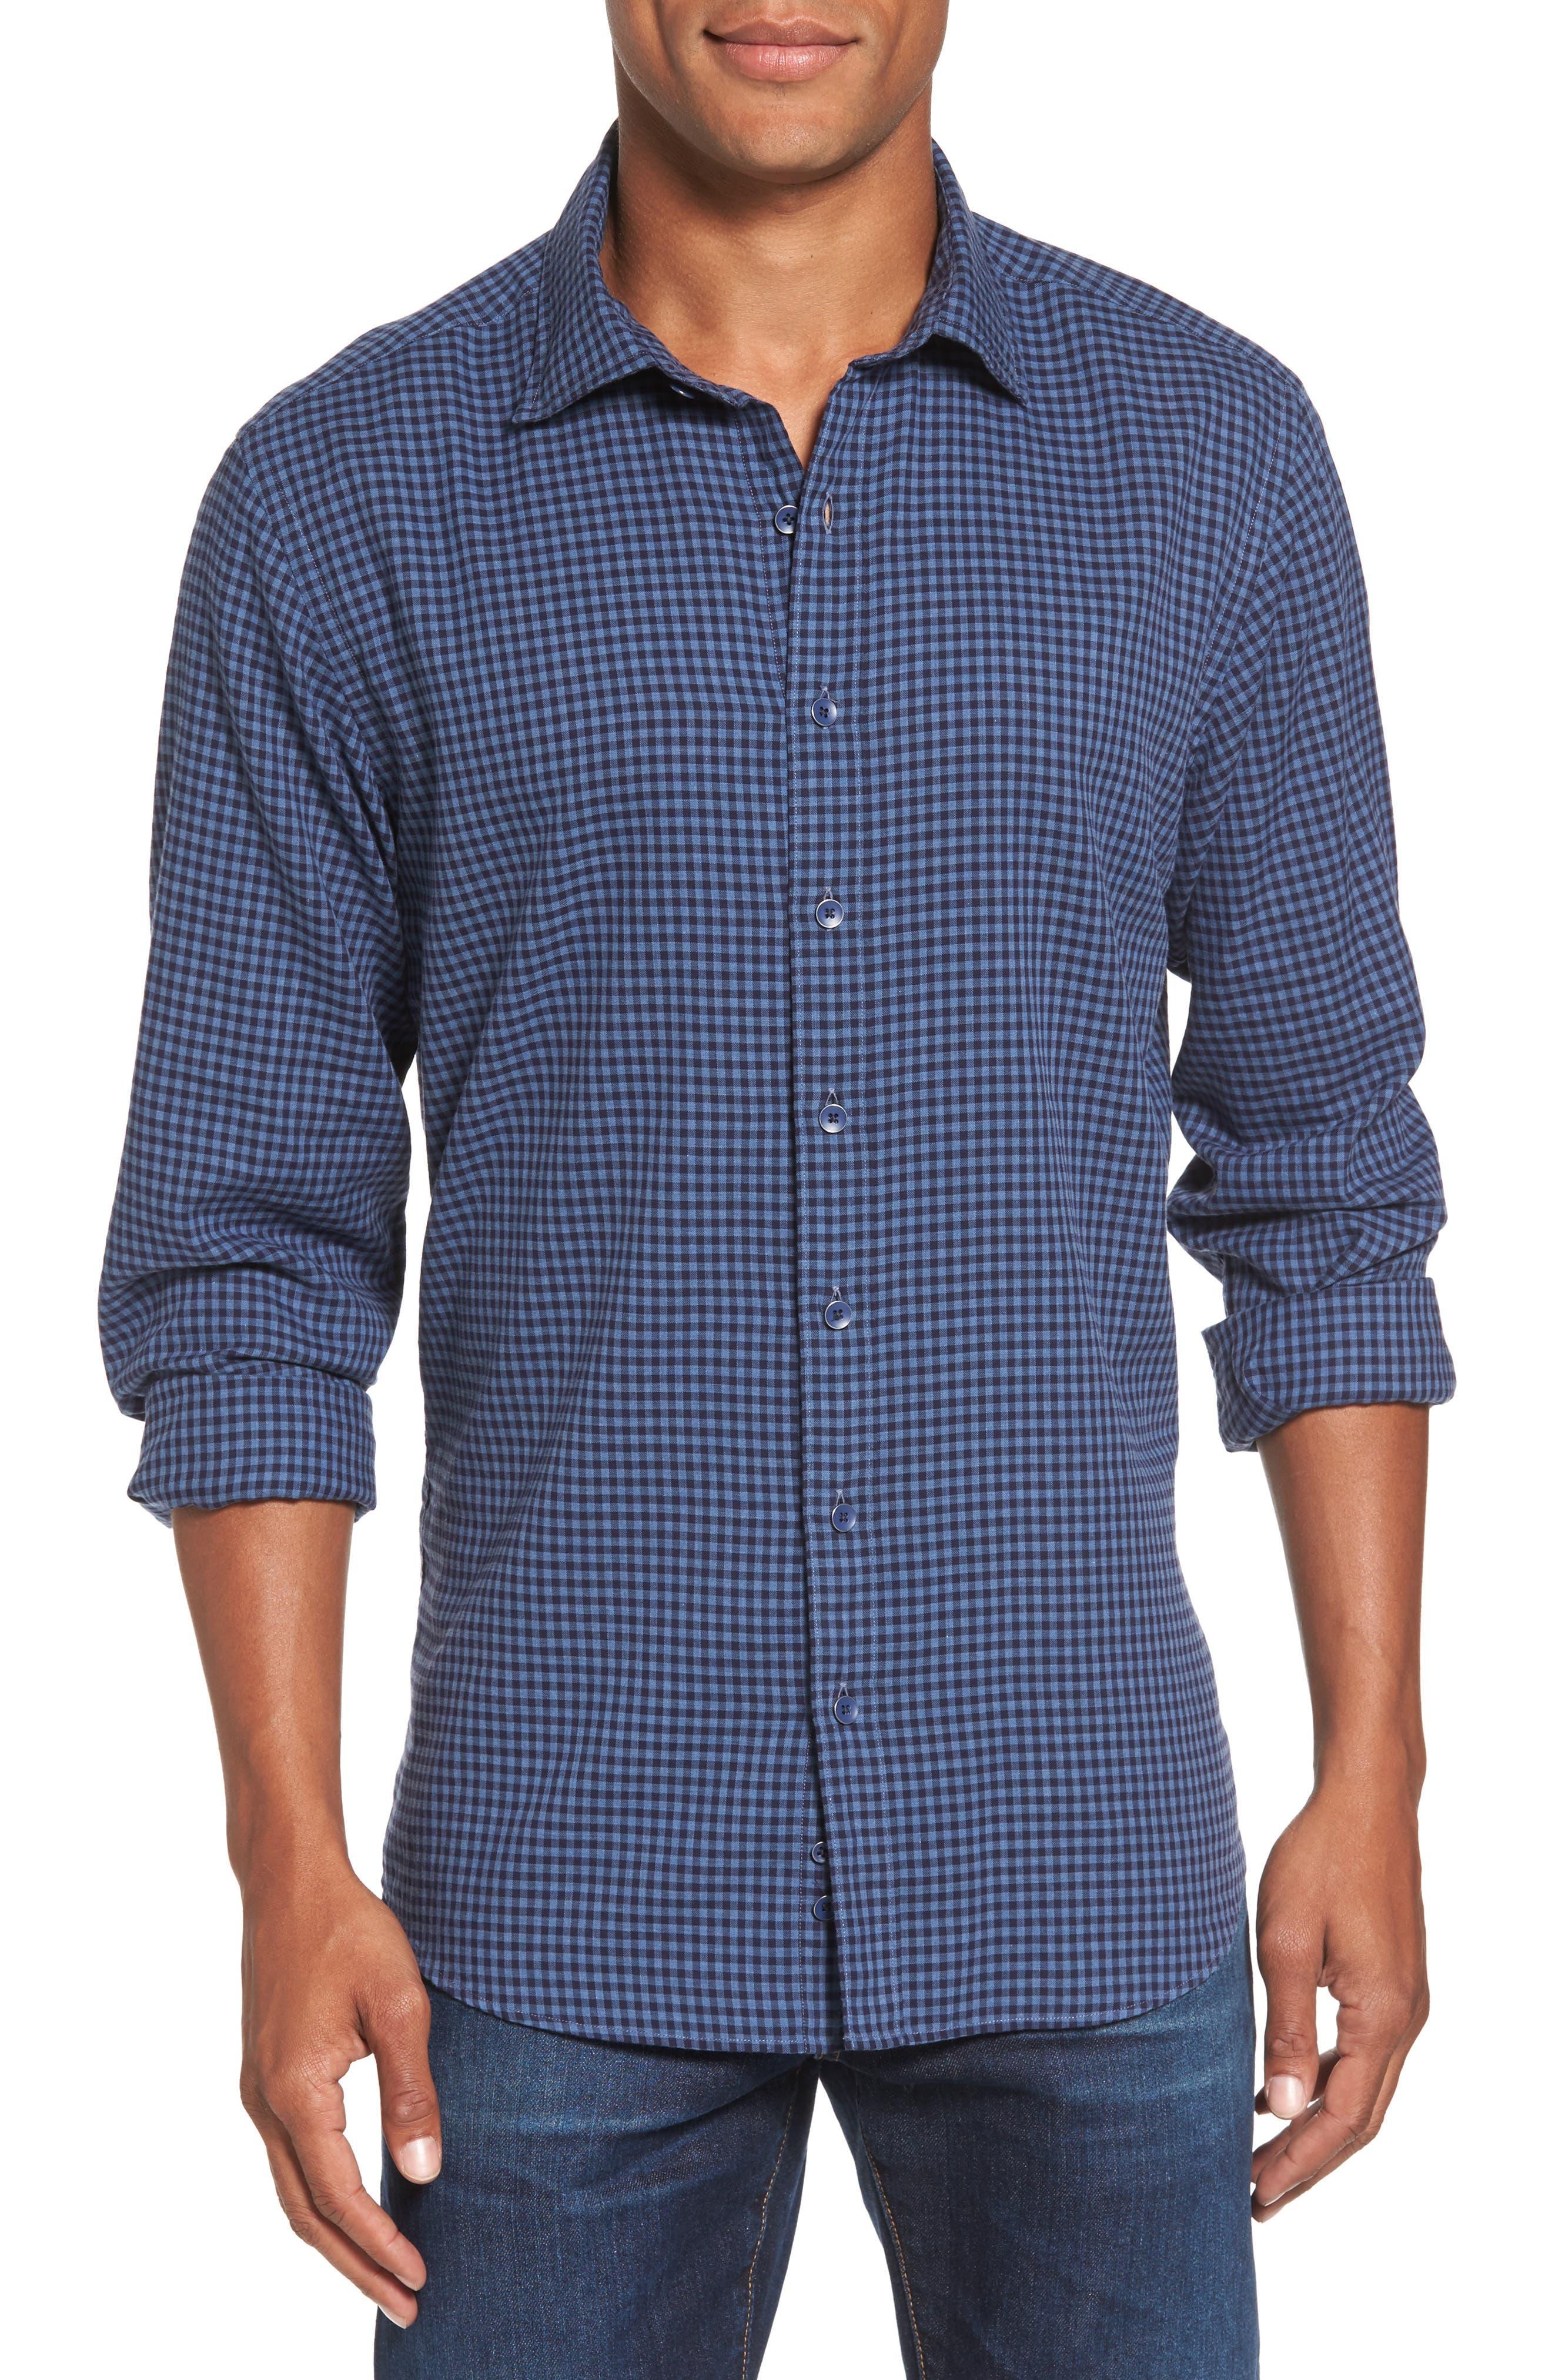 Alternate Image 1 Selected - Rodd & Gunn Kennington Regular Fit Gingham Sport Shirt